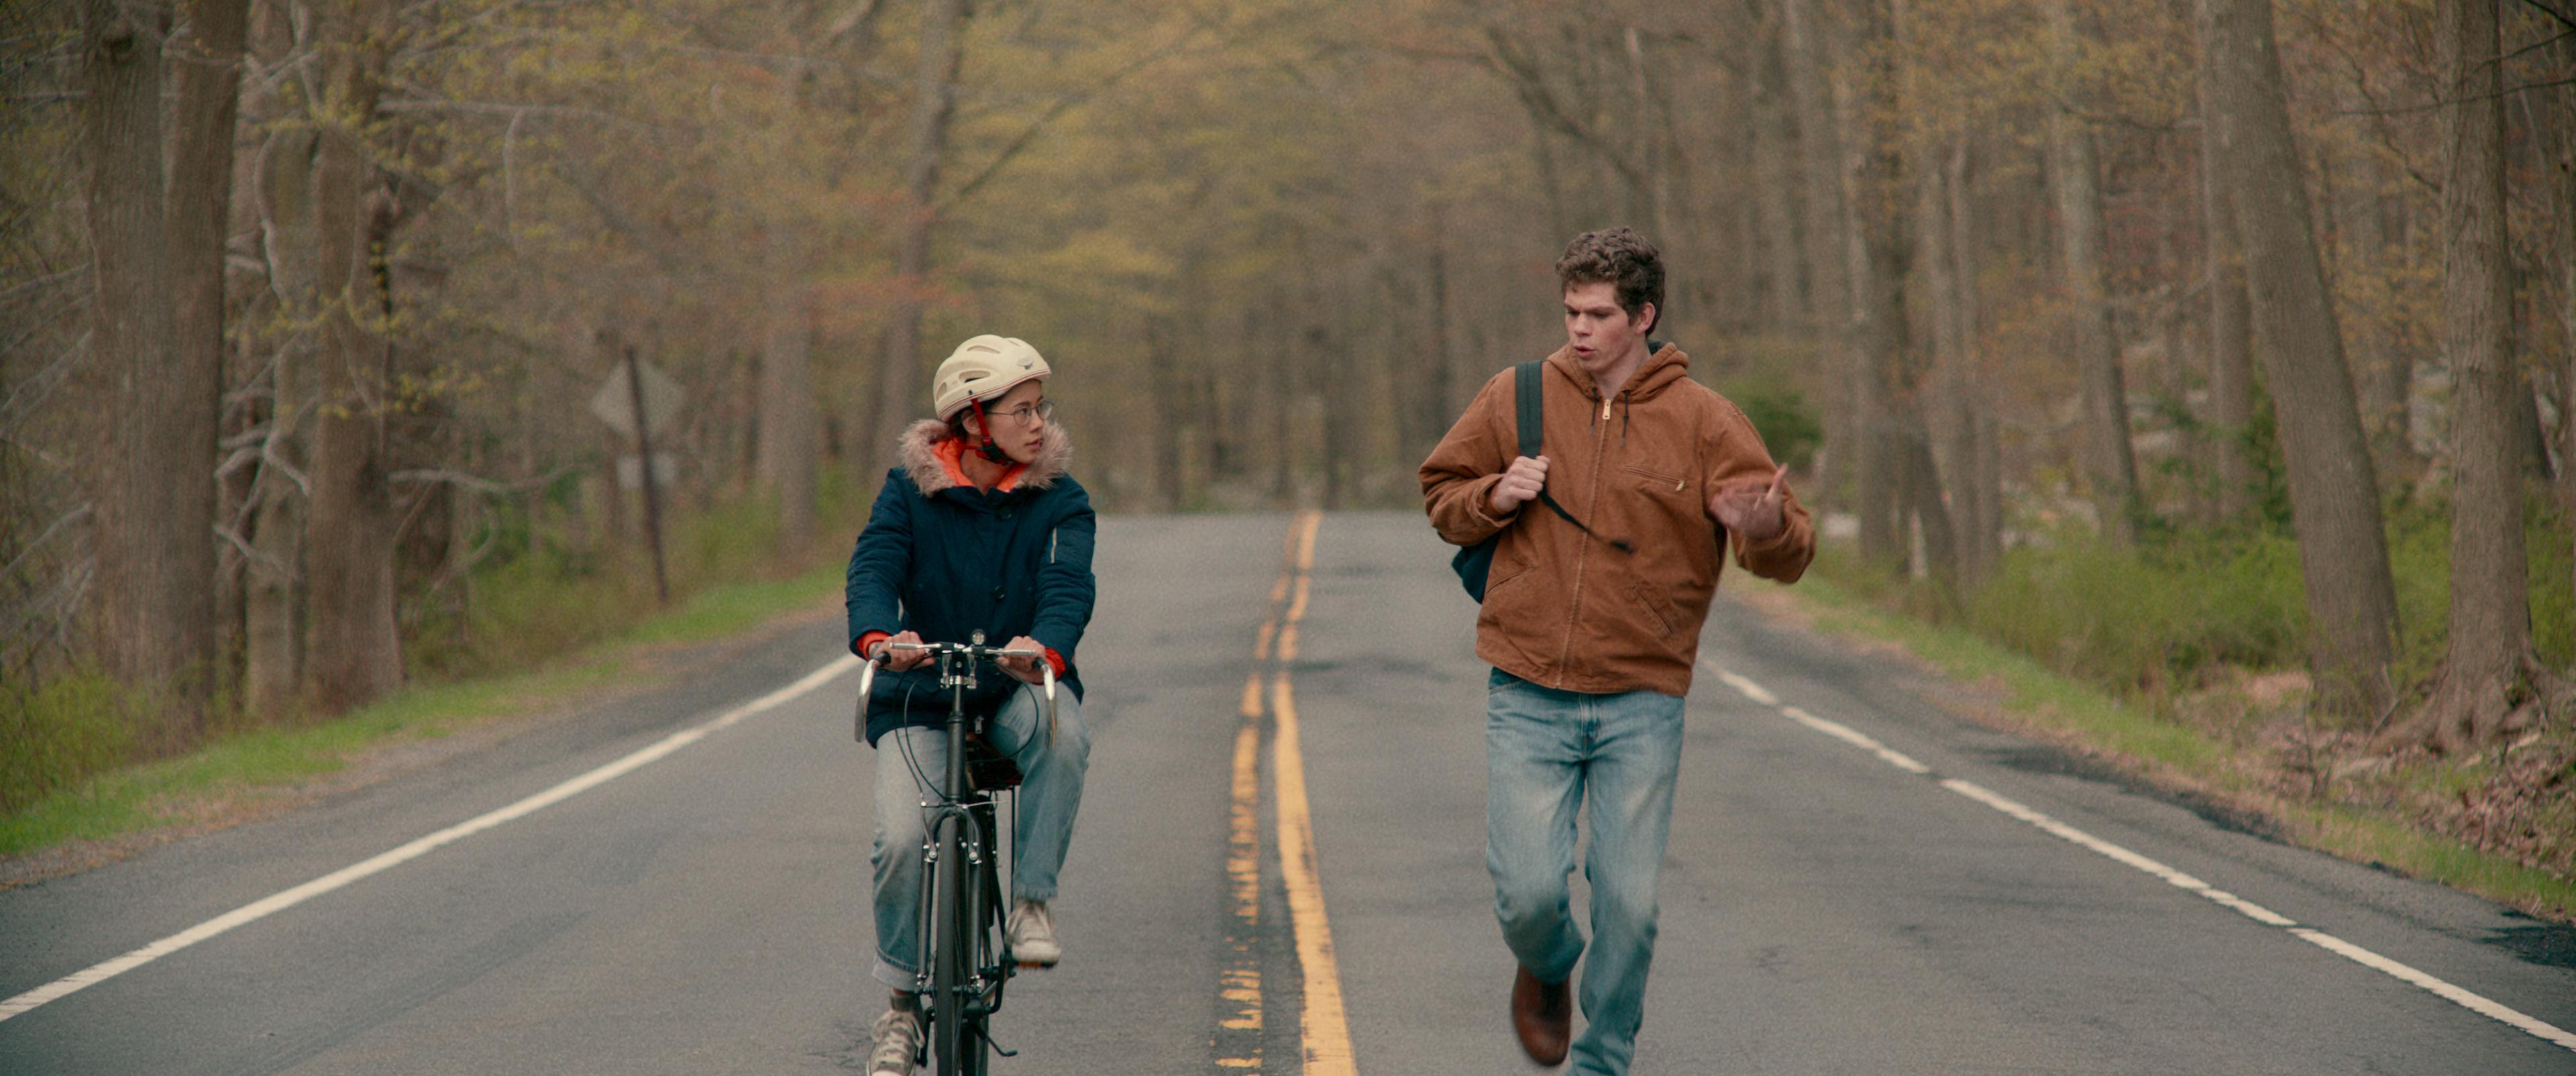 Leah Lewis and Daniel Diemer in The Half of It (2020)